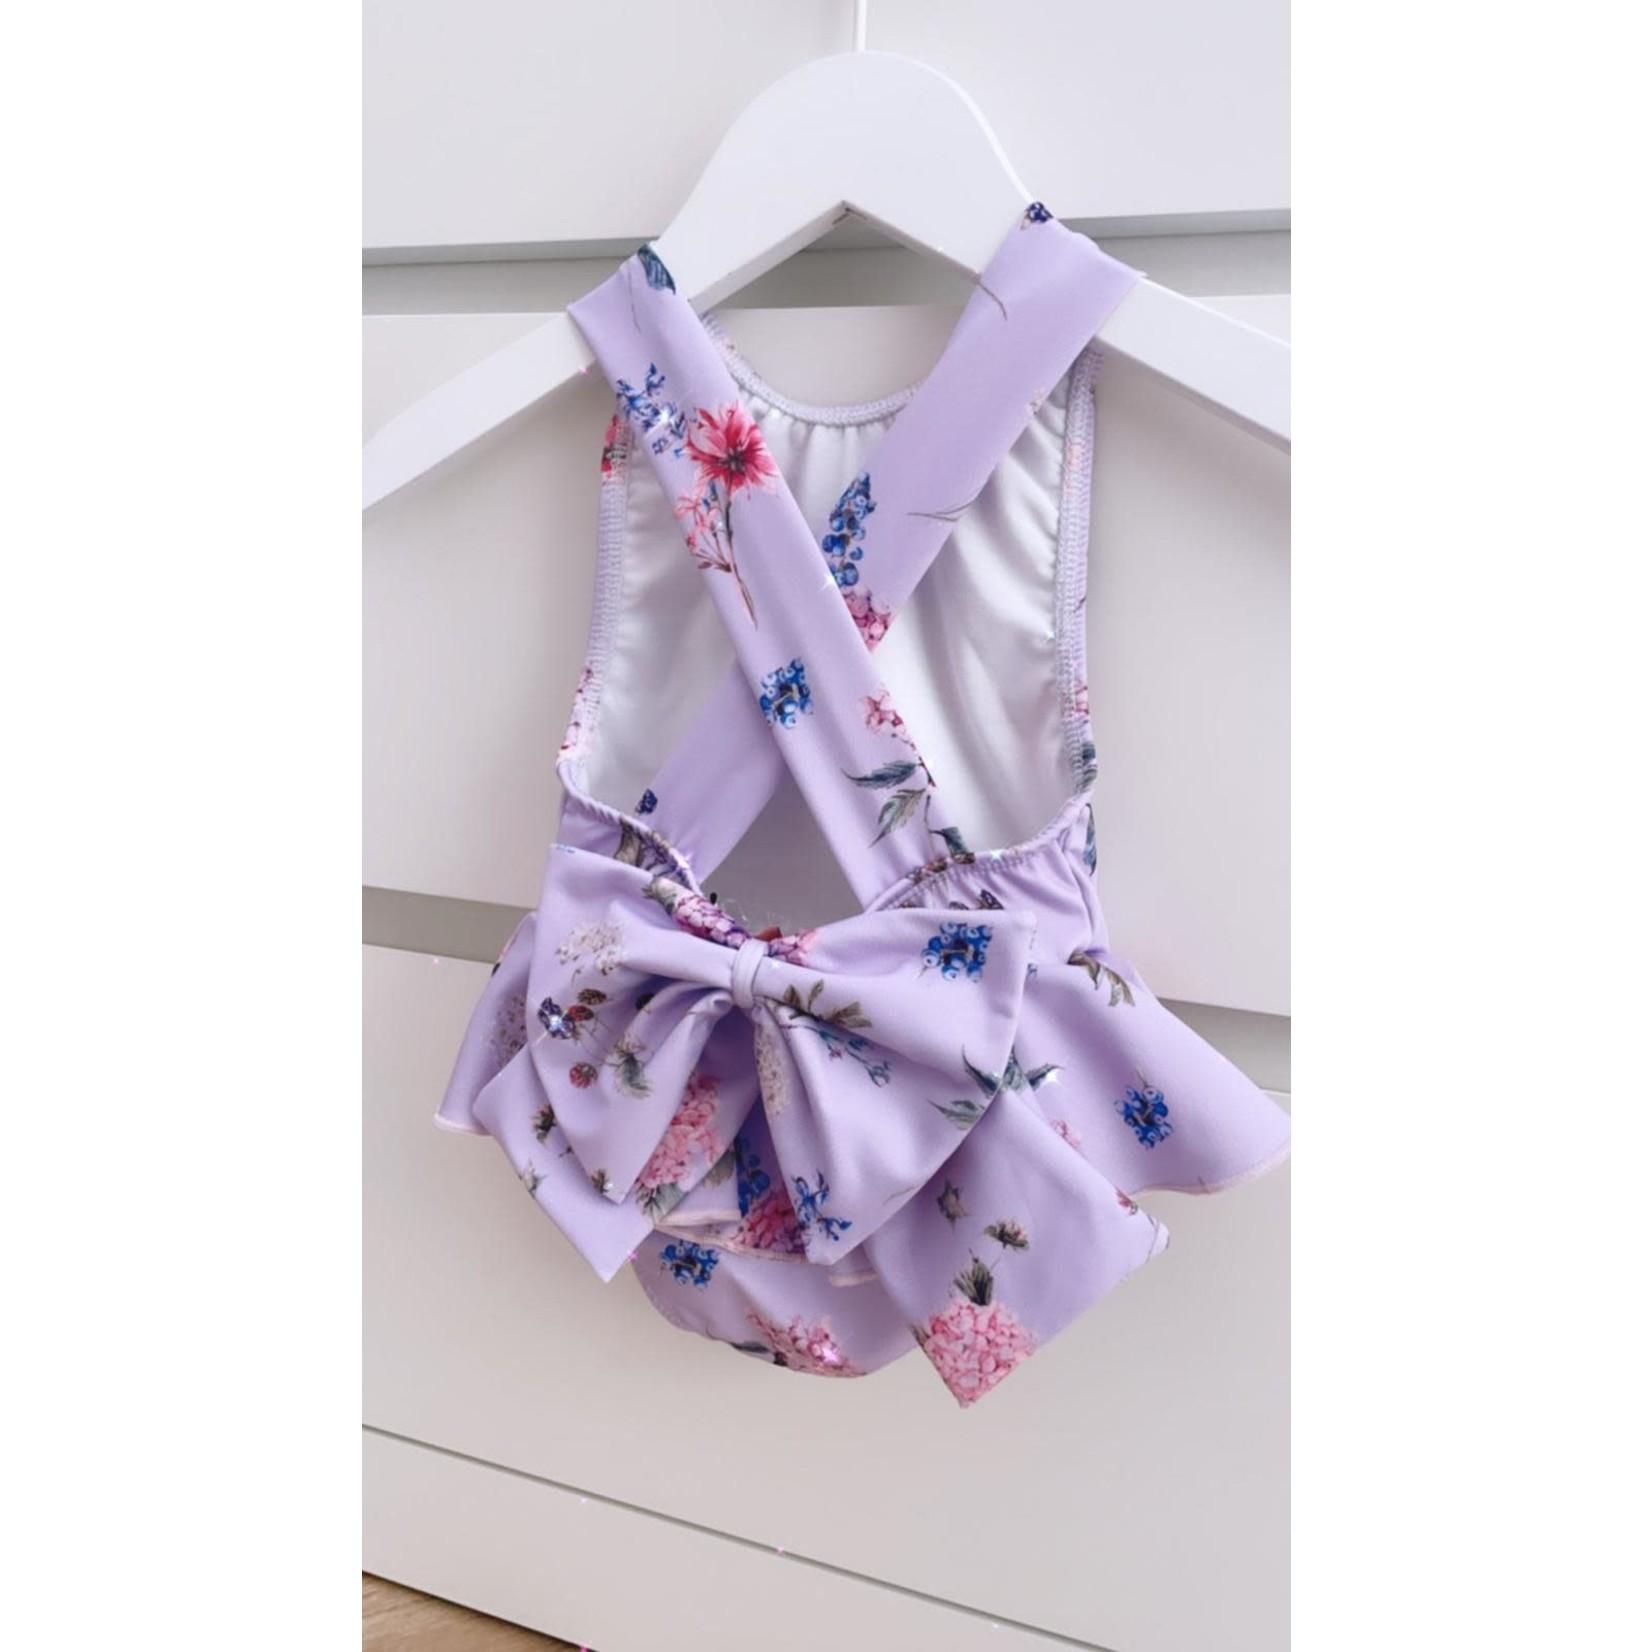 Petite Zara Swimsuit